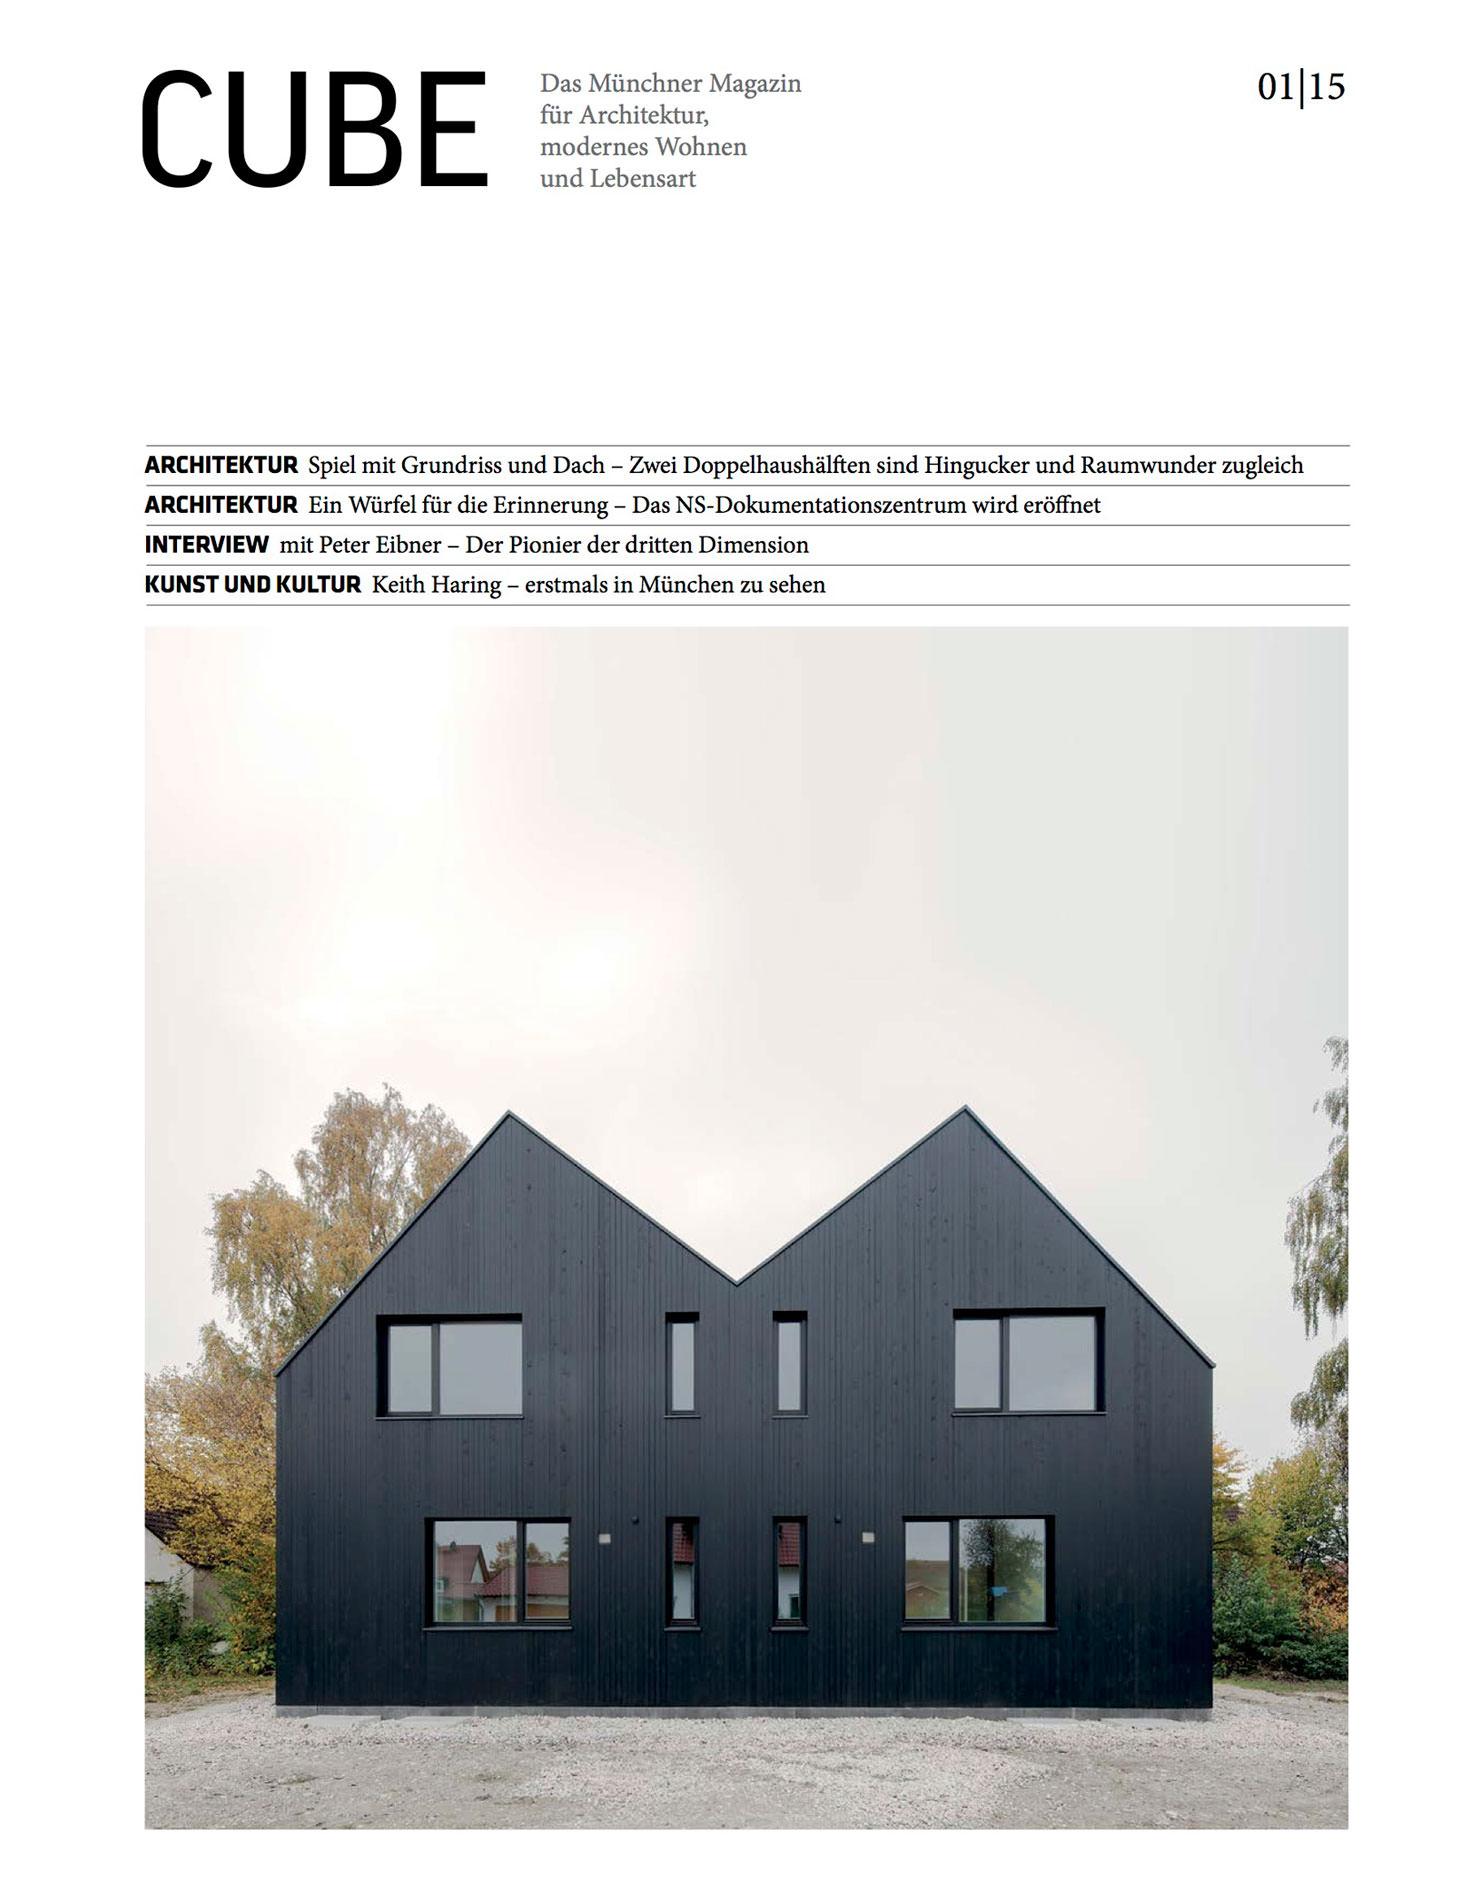 CUBE Magazine - restaurant freiraum | CBA Clemens Bachmann ...